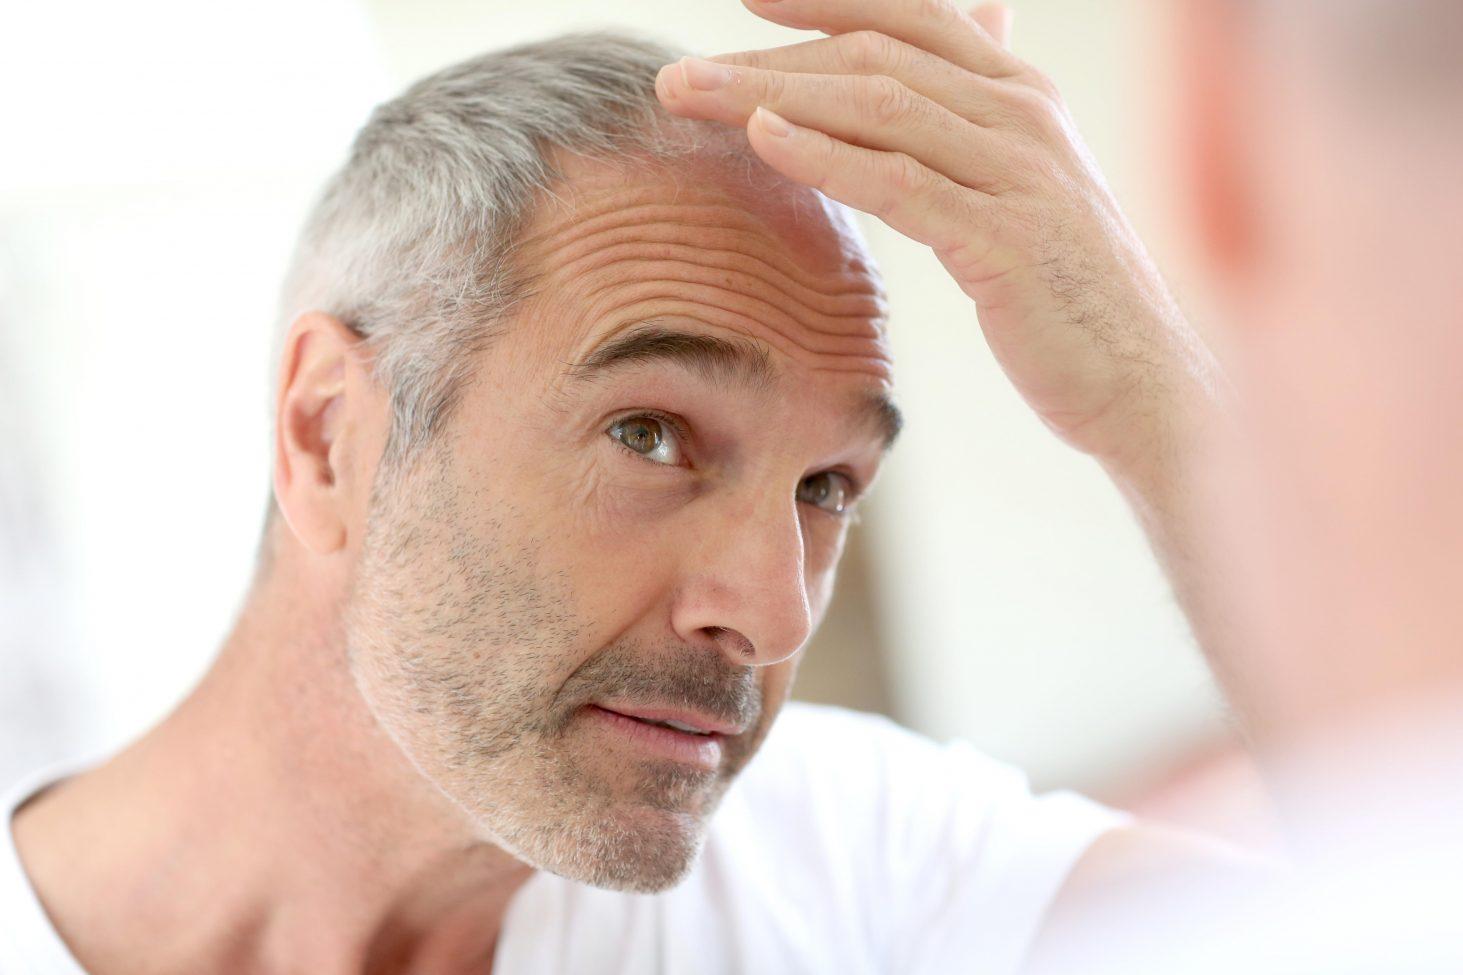 Greffe de cheveux, informations utiles